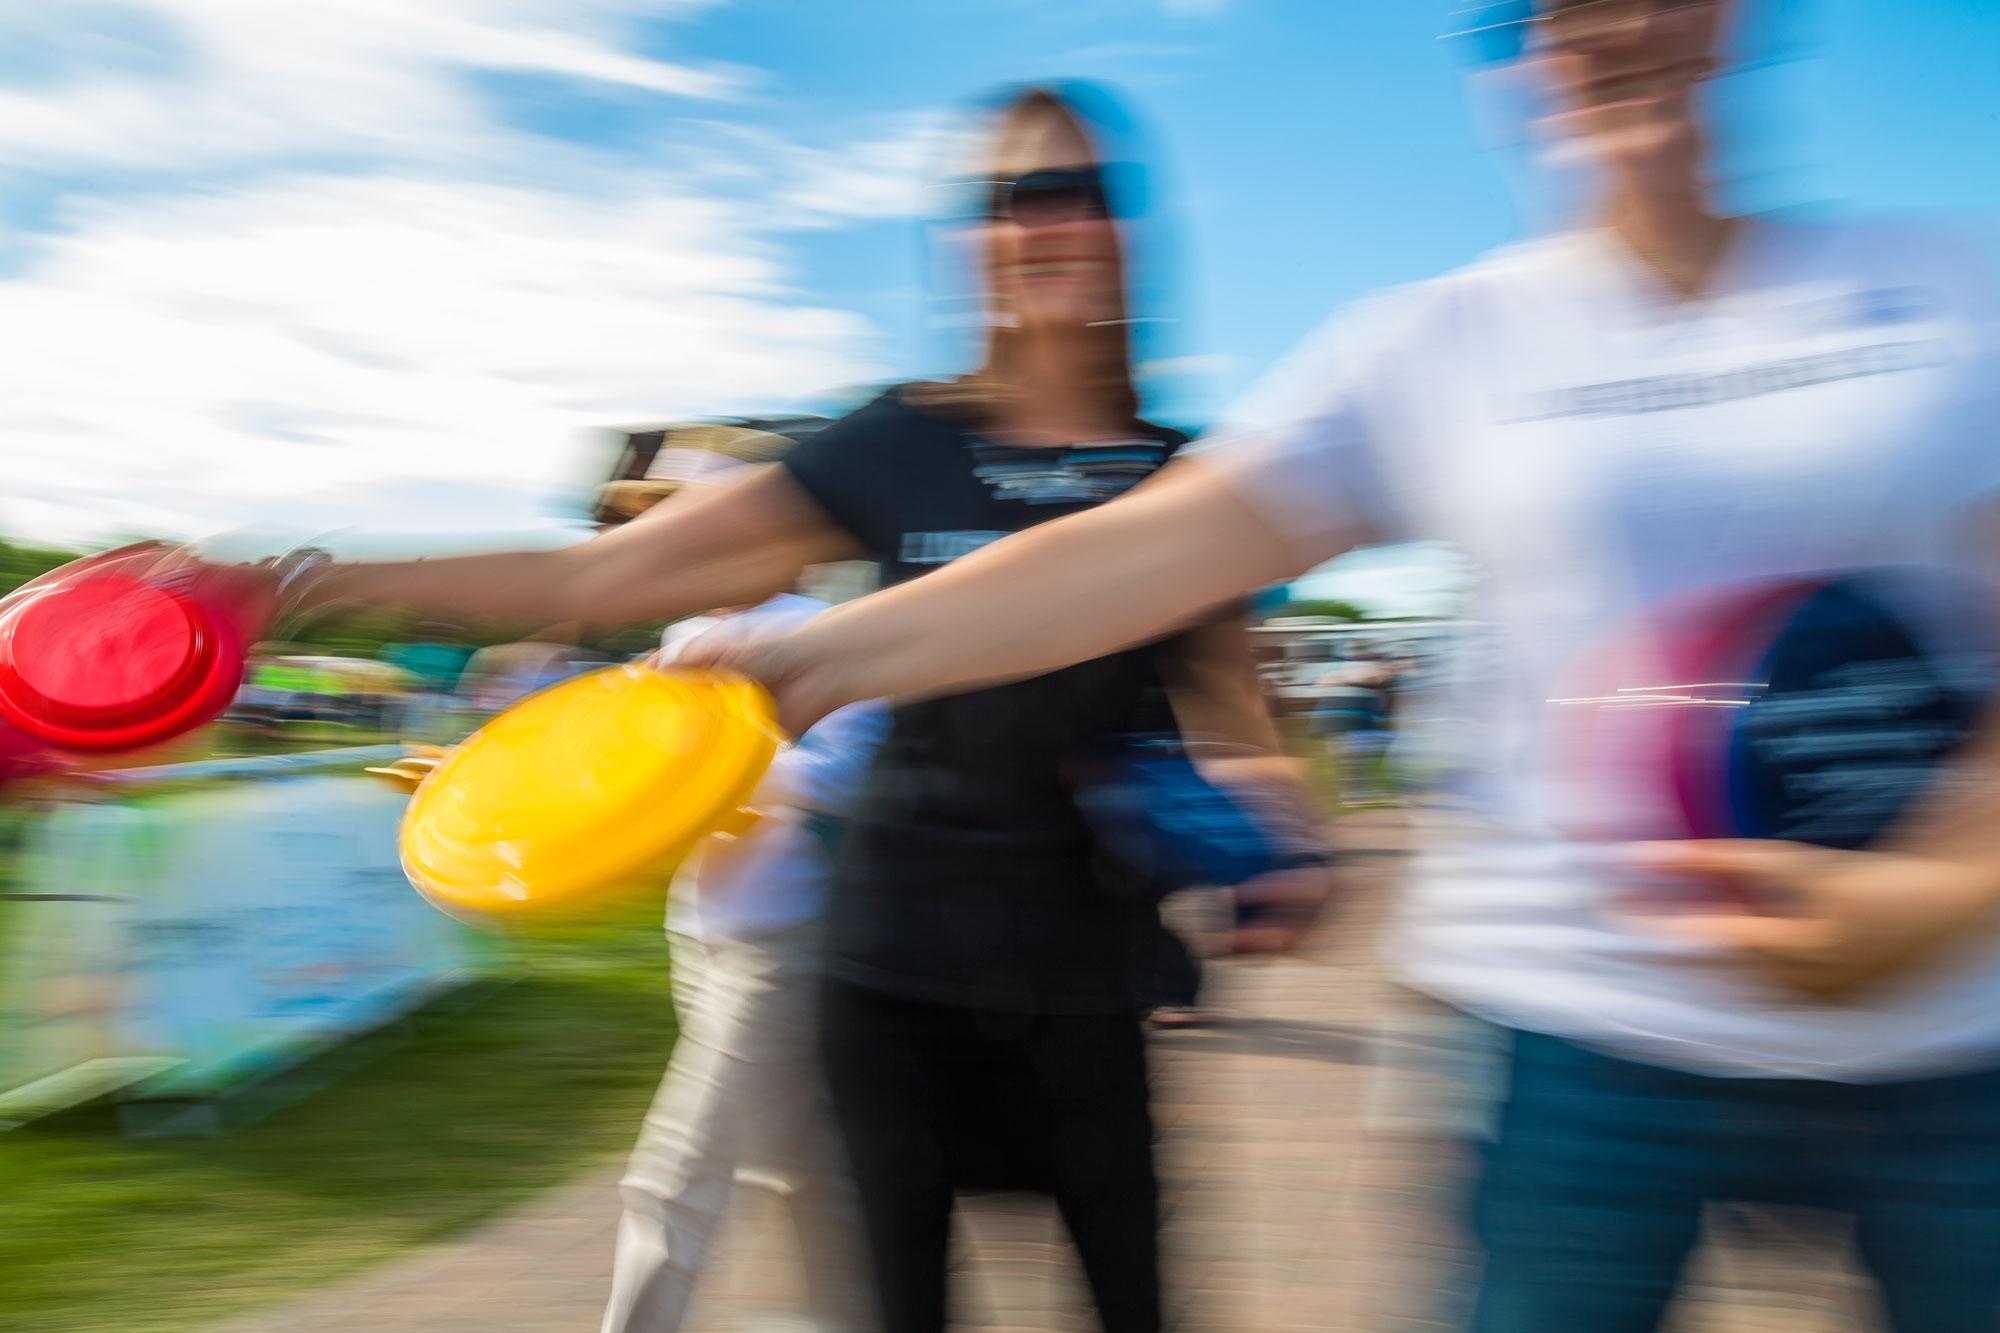 IMAGE: People throwing frisbees in St. Cloud